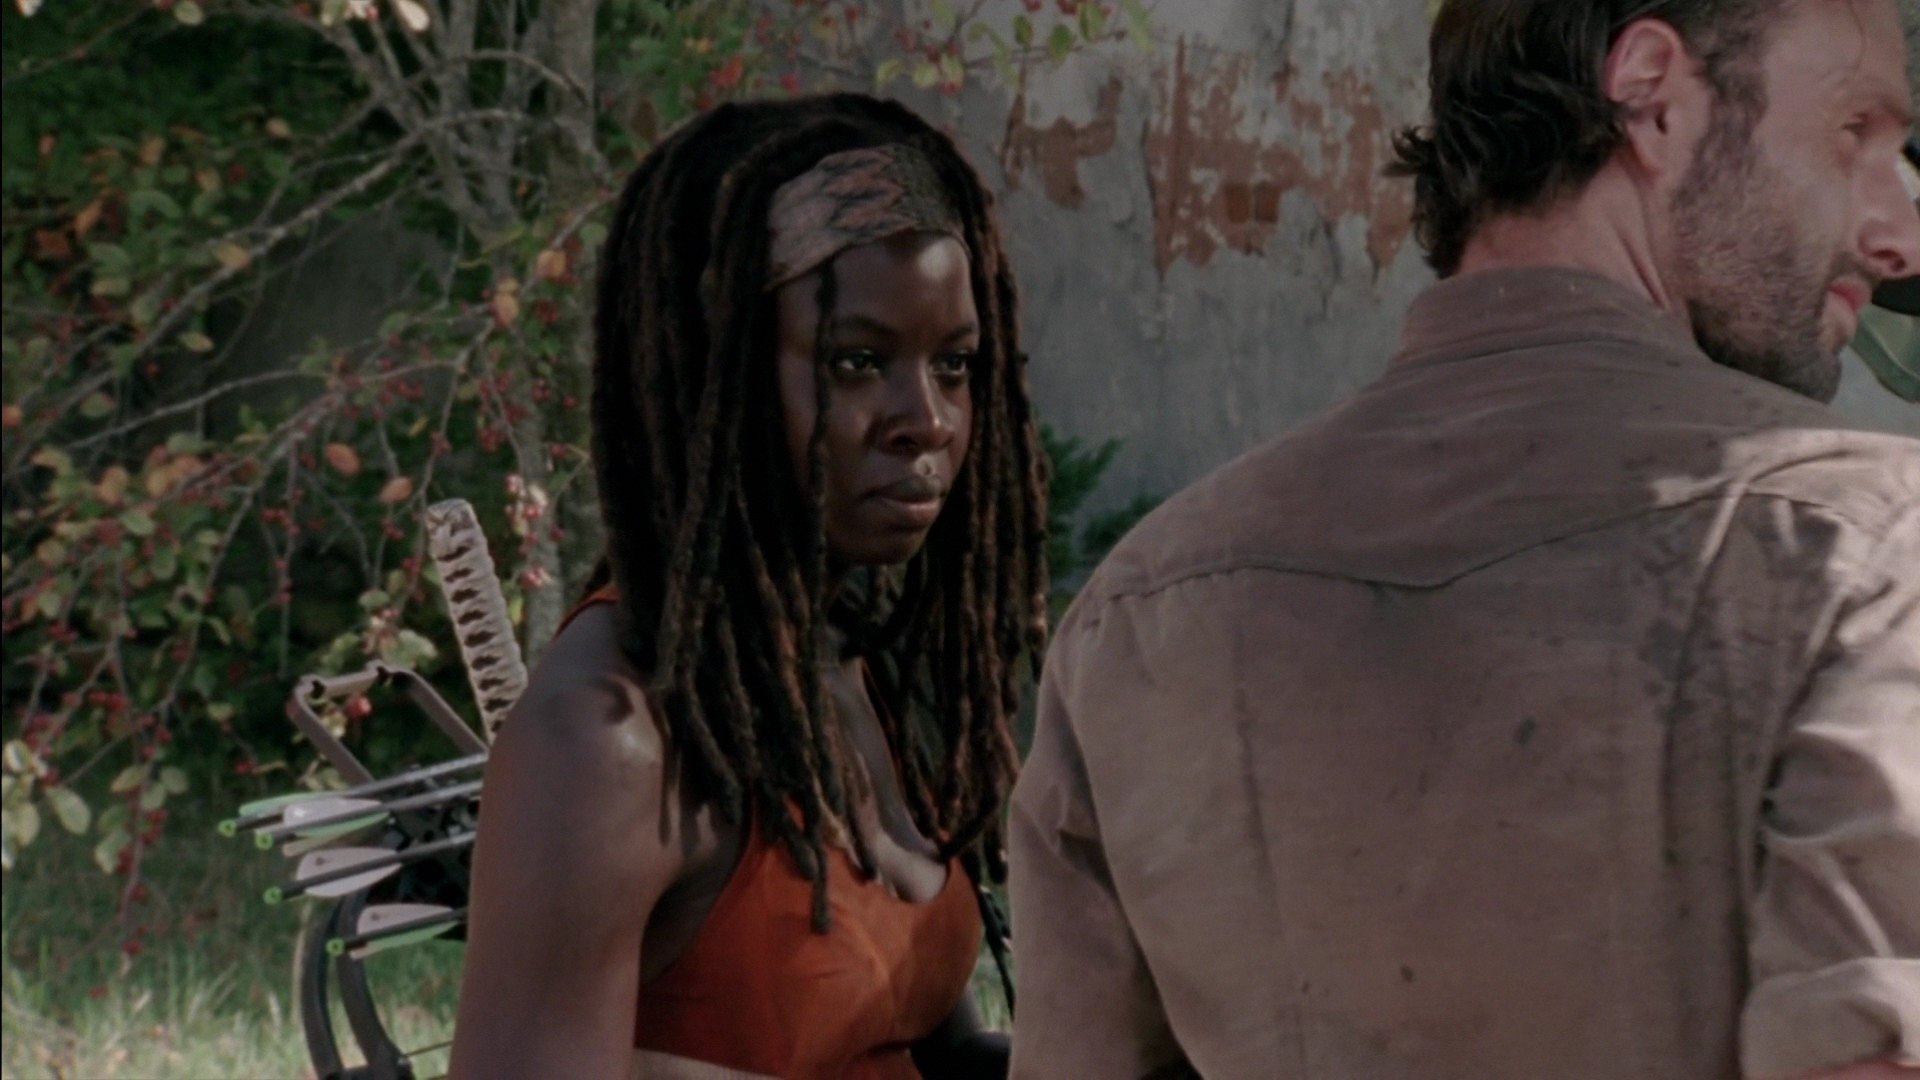 'The Walking Dead' Season 3 Episode 12 Captures